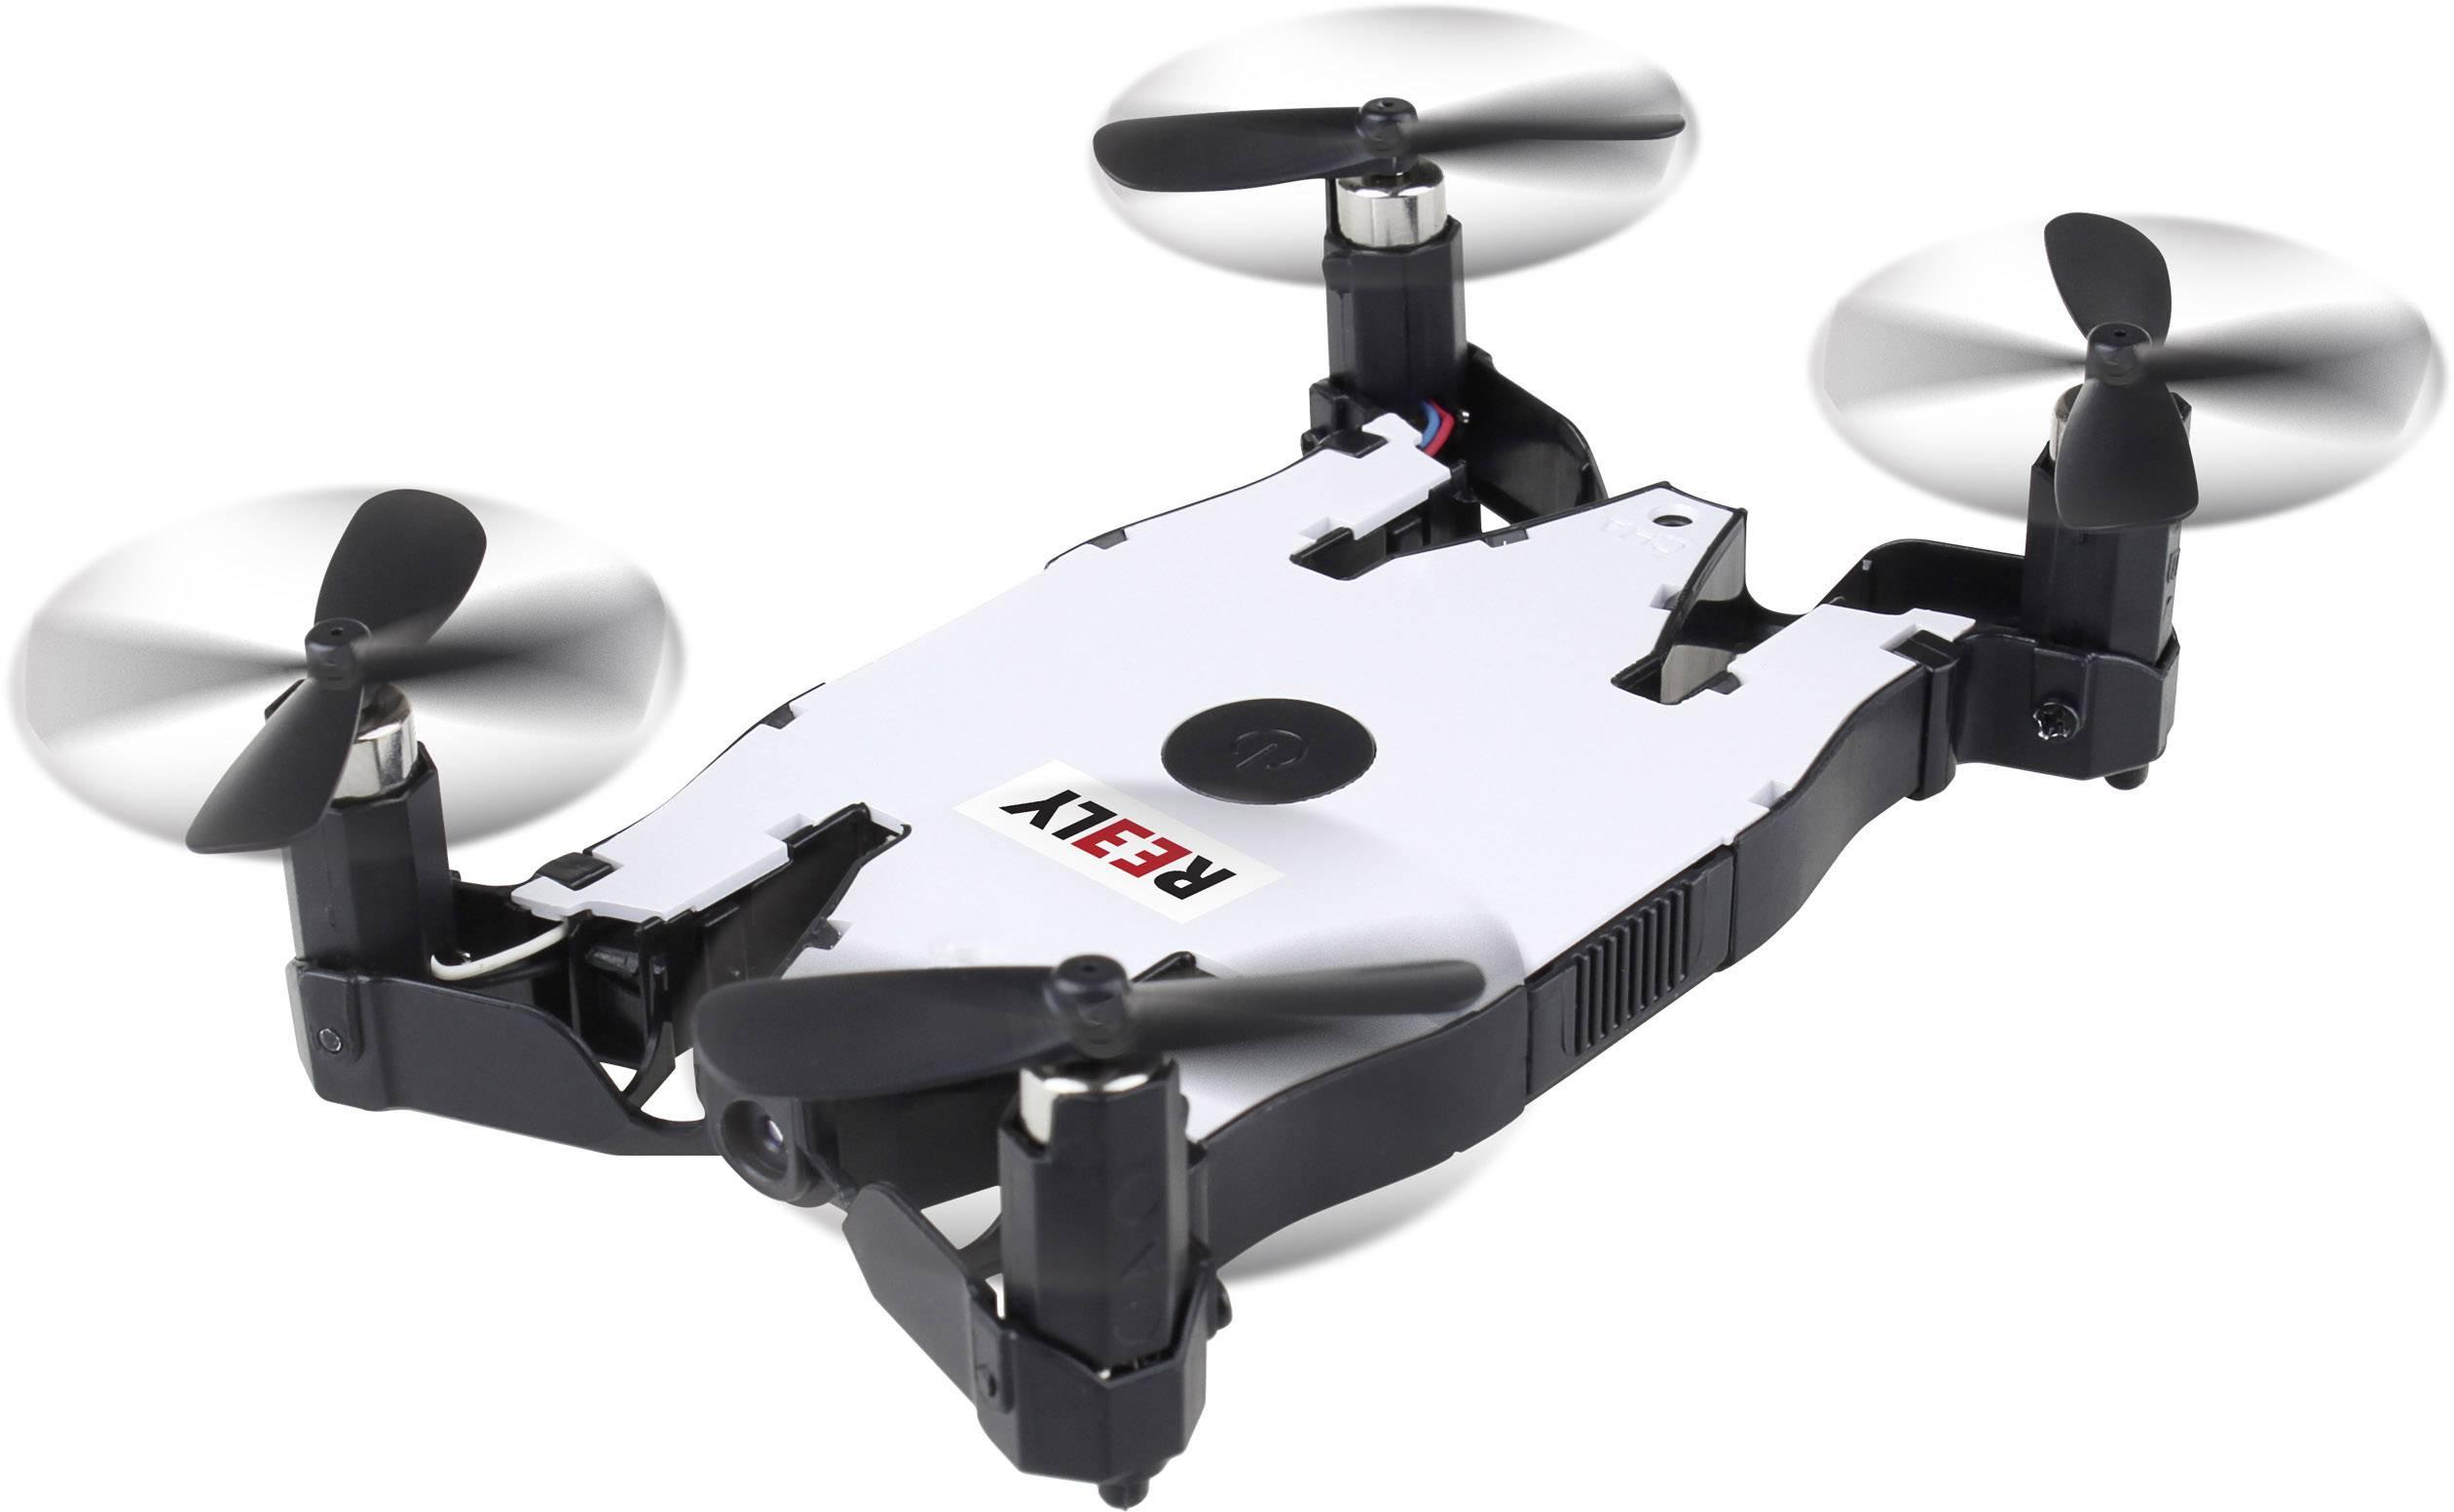 Dron Reely Pocket Drone, RtF